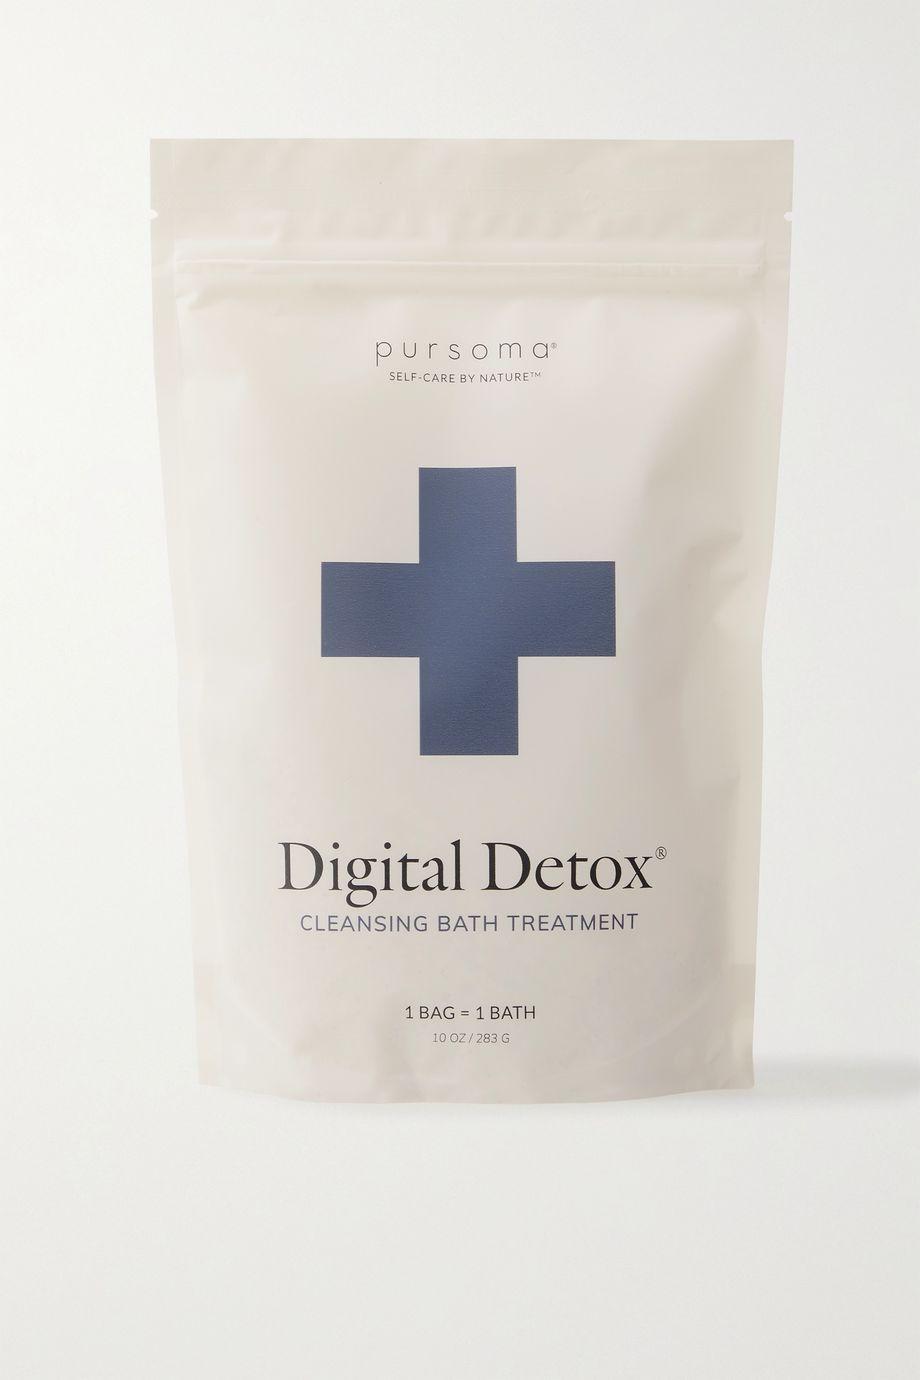 Pursoma Digital Detox Bath Soak, 283g